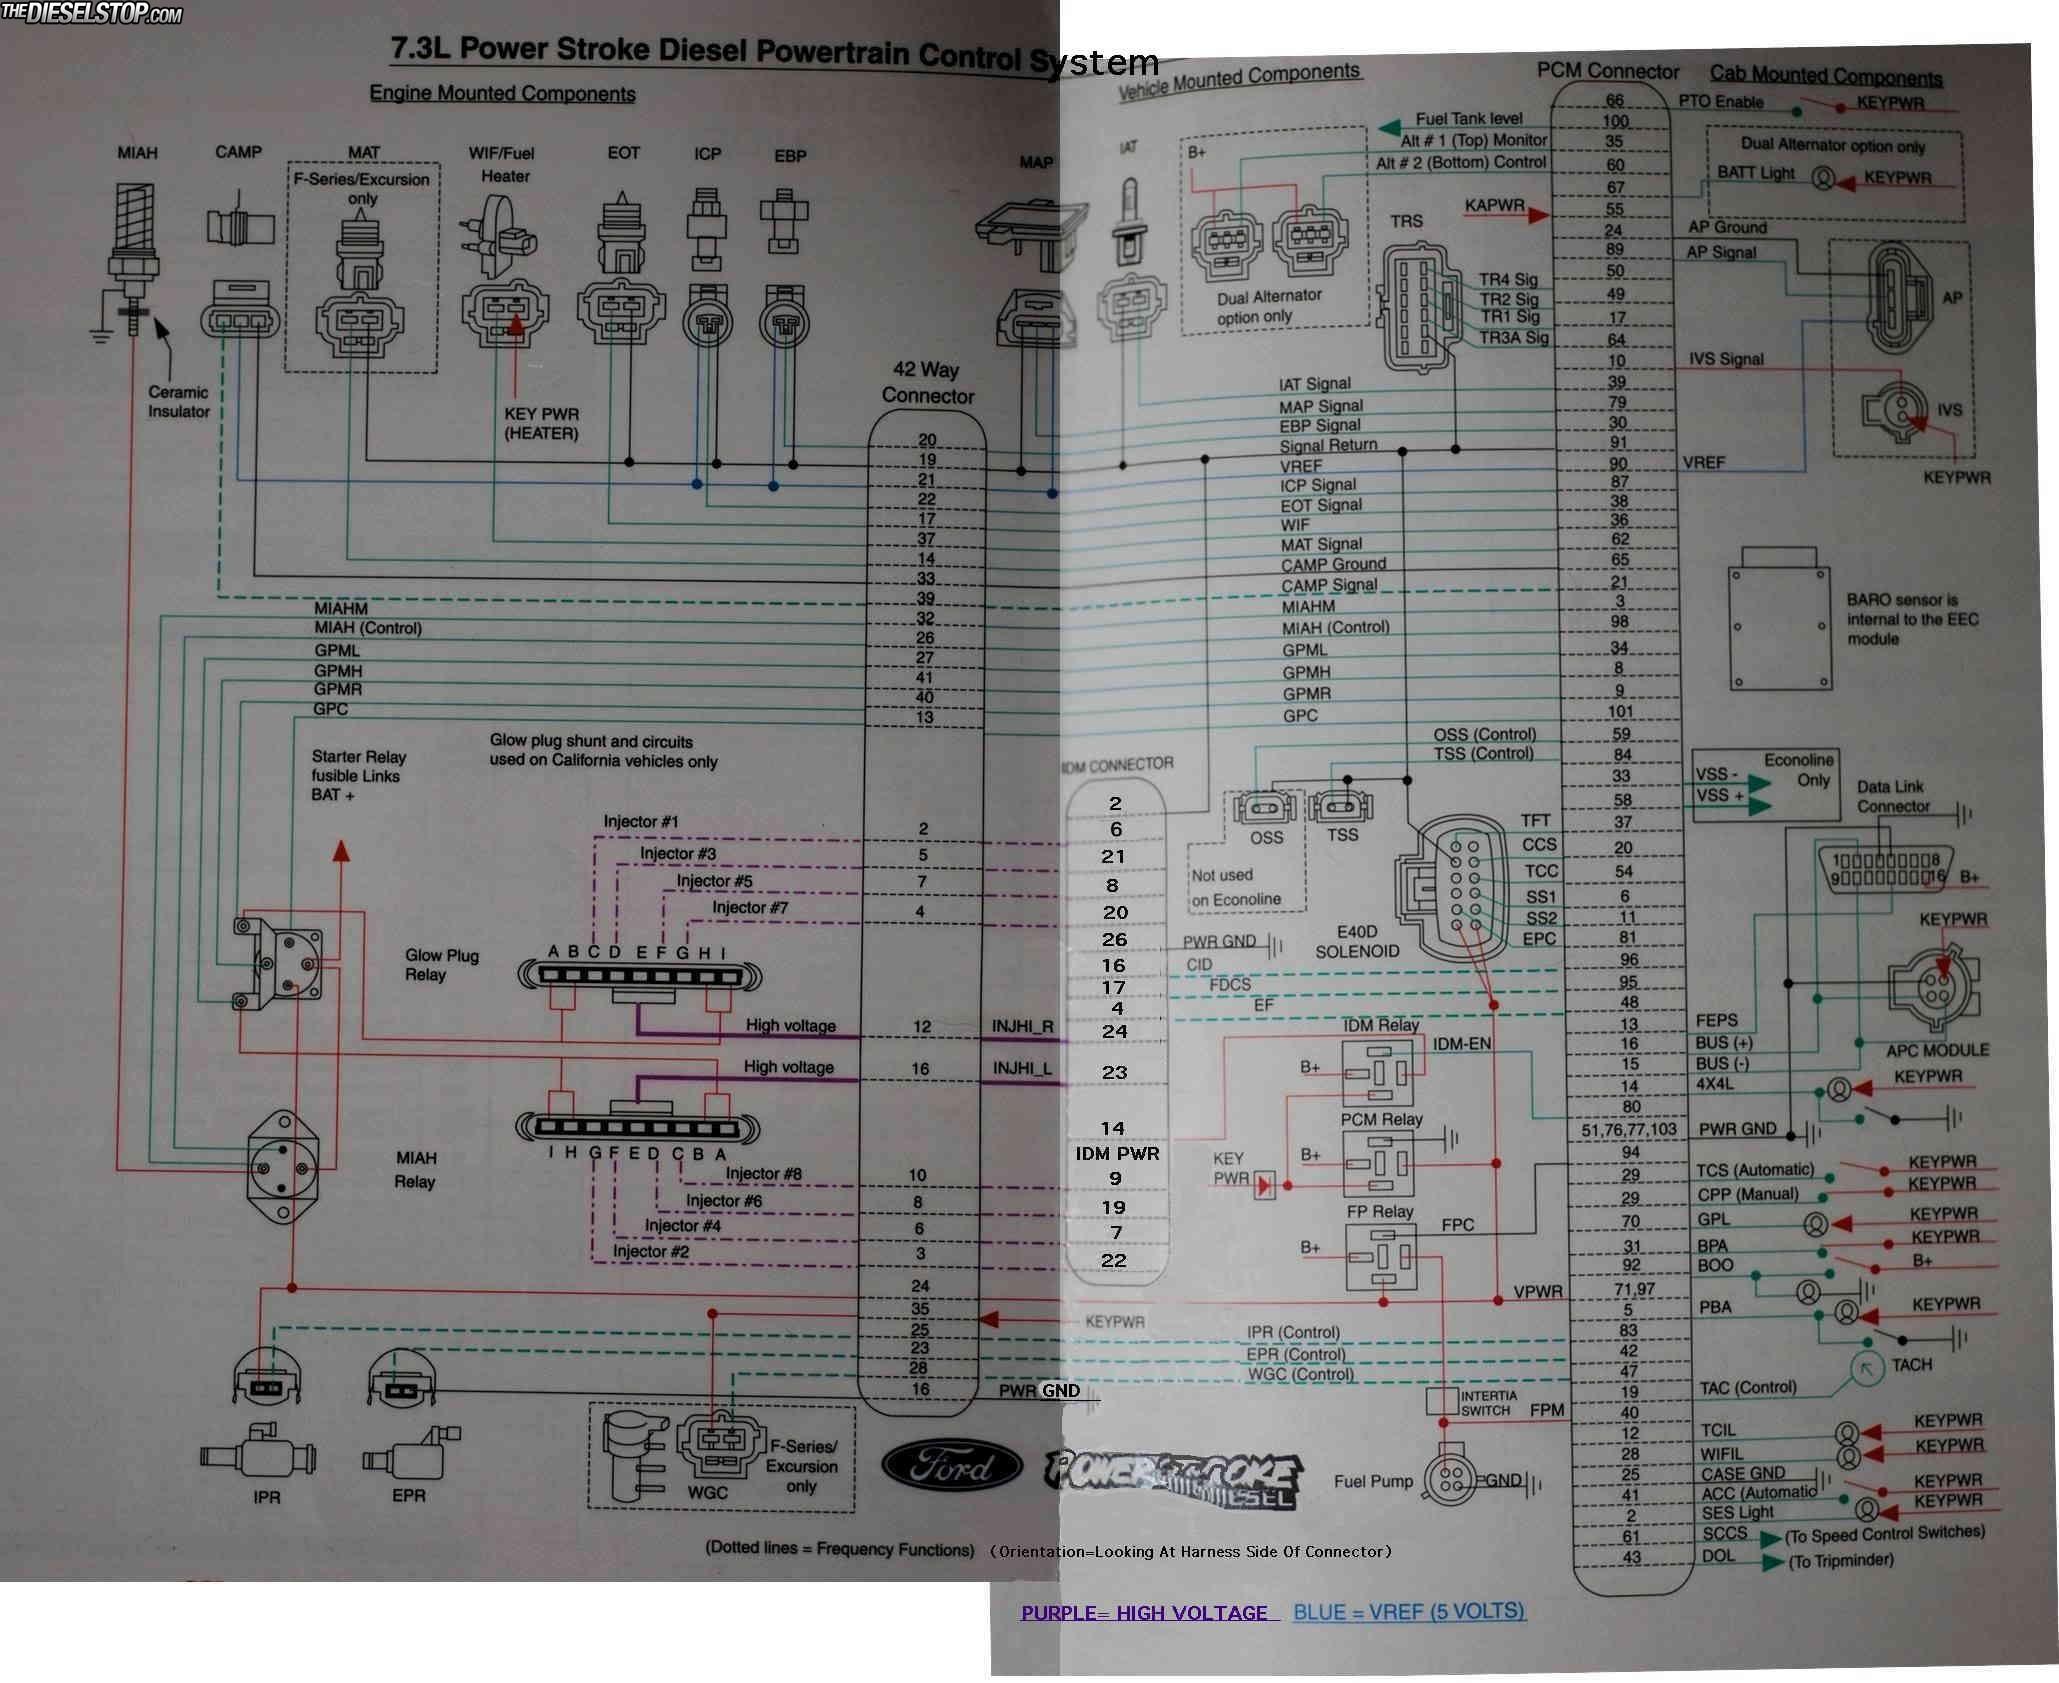 6 0 L Powerstroke Engine Diagram 7 3l Wiring Schematic Printable Very Handy Diesel forum Of 6 0 L Powerstroke Engine Diagram